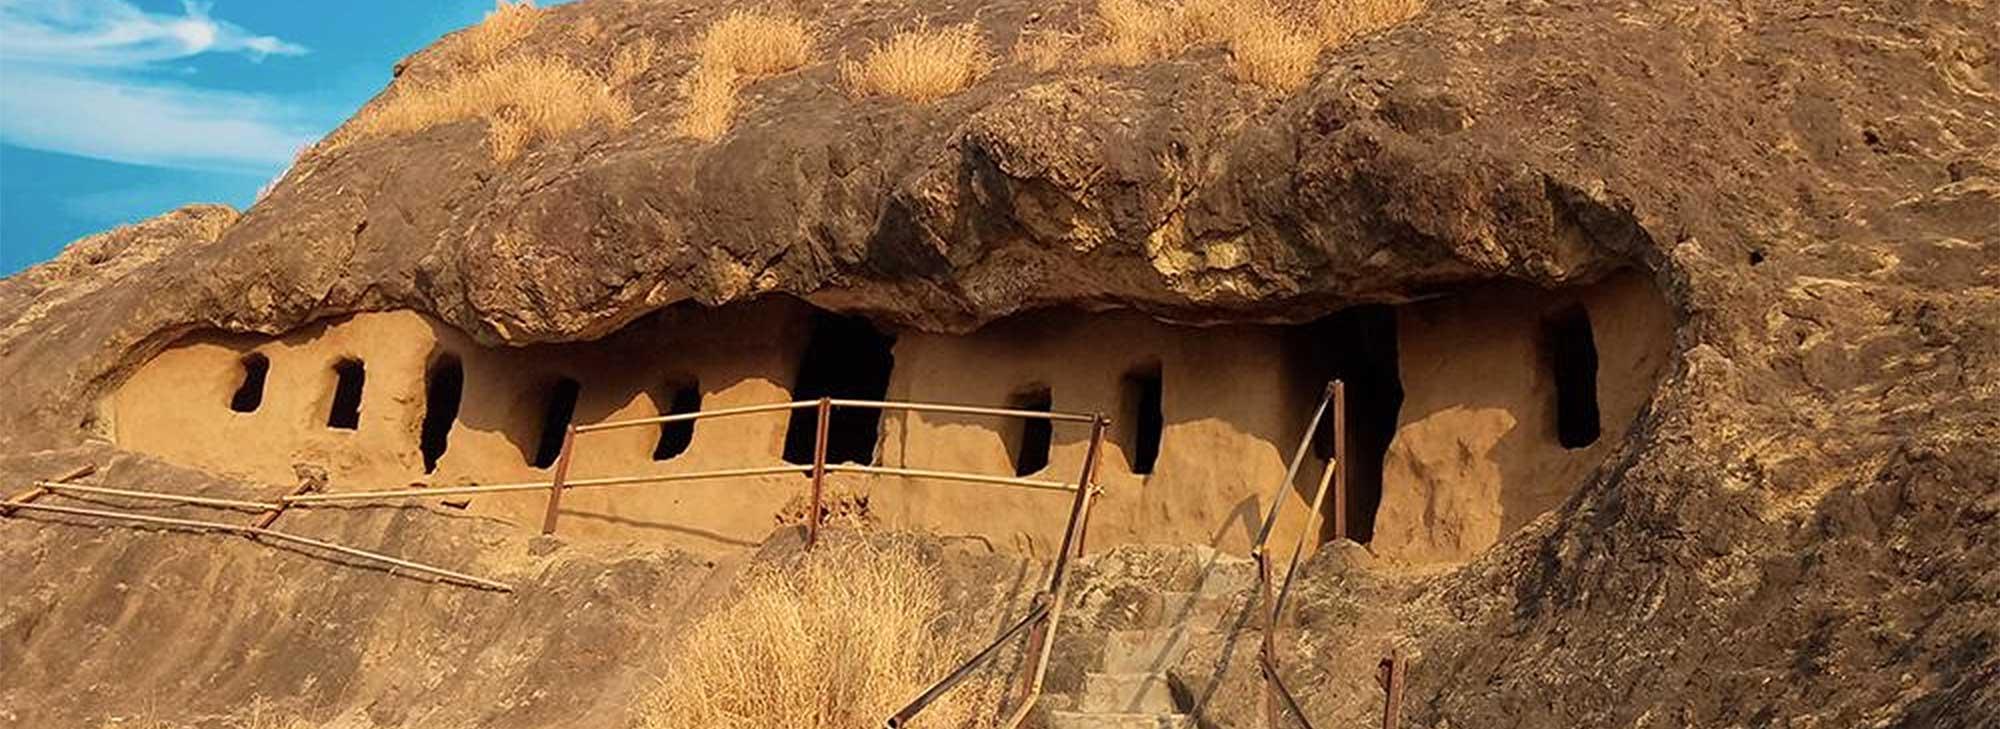 Kadia-Dungar-Caves-banner.jpg